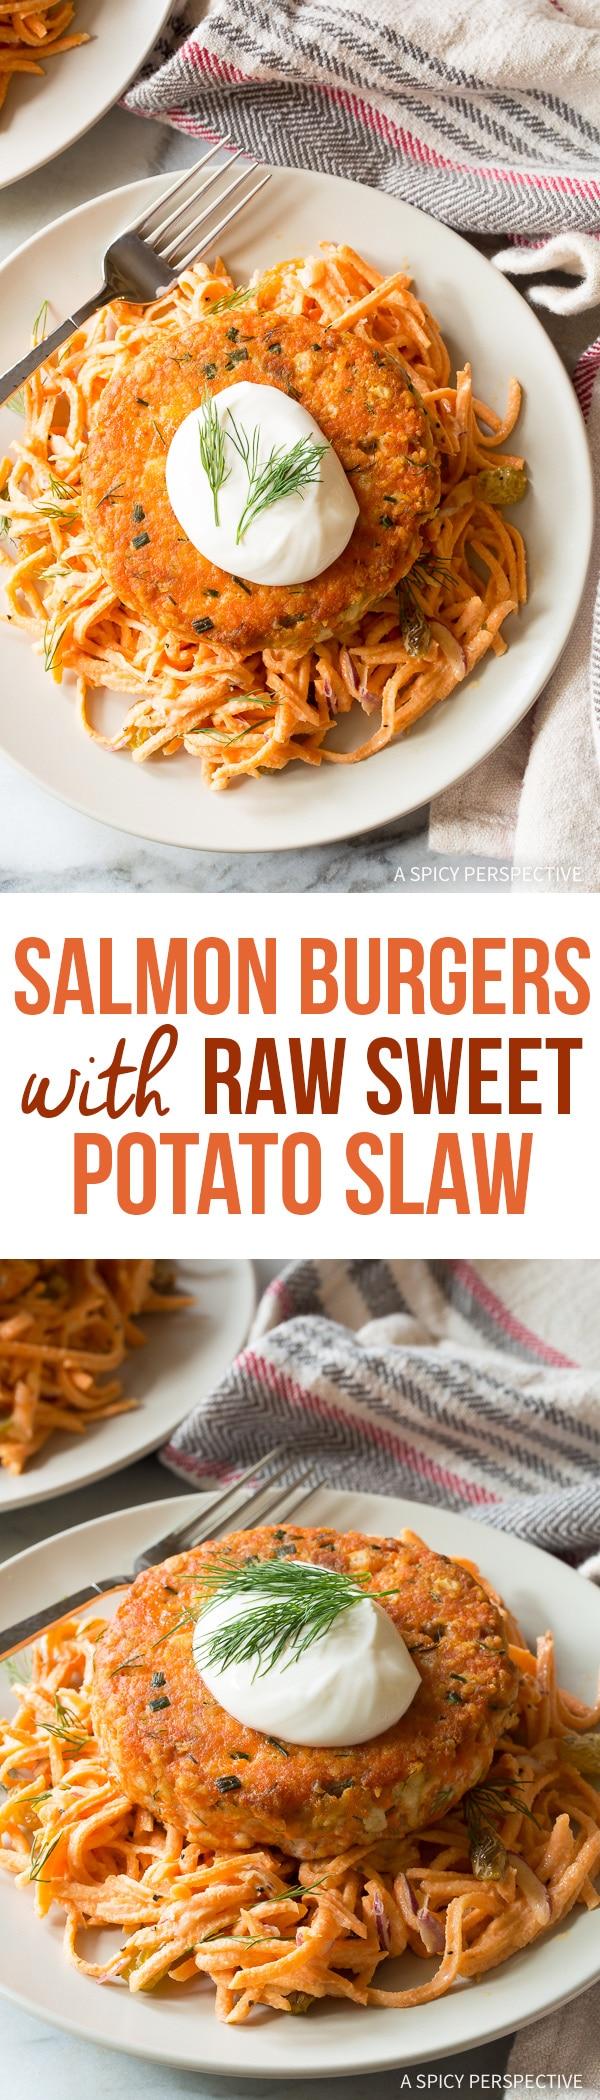 Zesty Salmon Burgers with Sweet Potato Slaw Recipe for Spring!